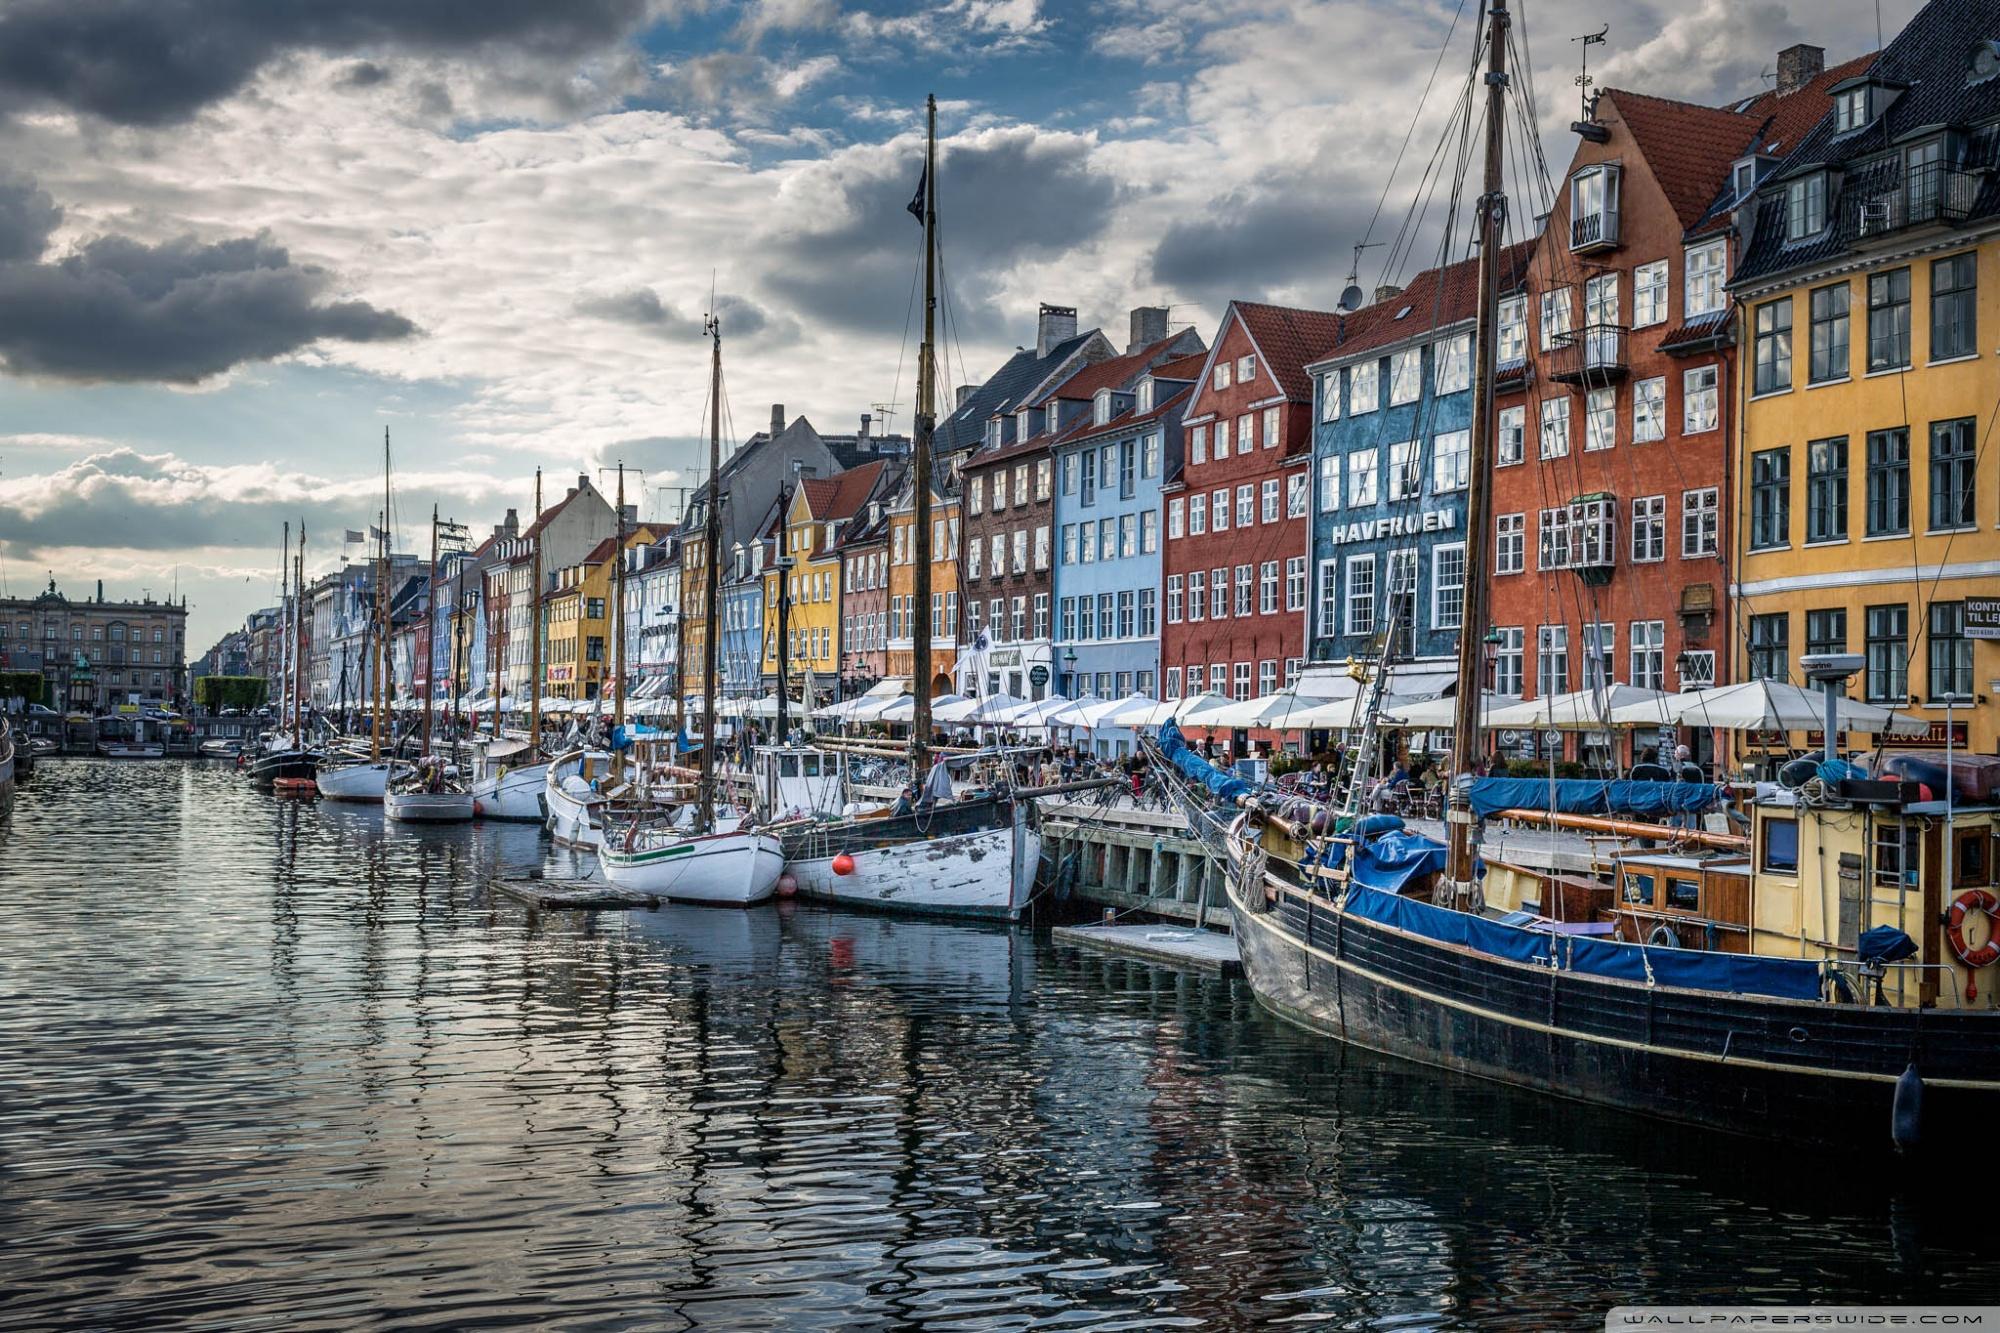 Copenhagen Denmark 4K HD Desktop Wallpaper for 4K Ultra HD TV 2000x1333